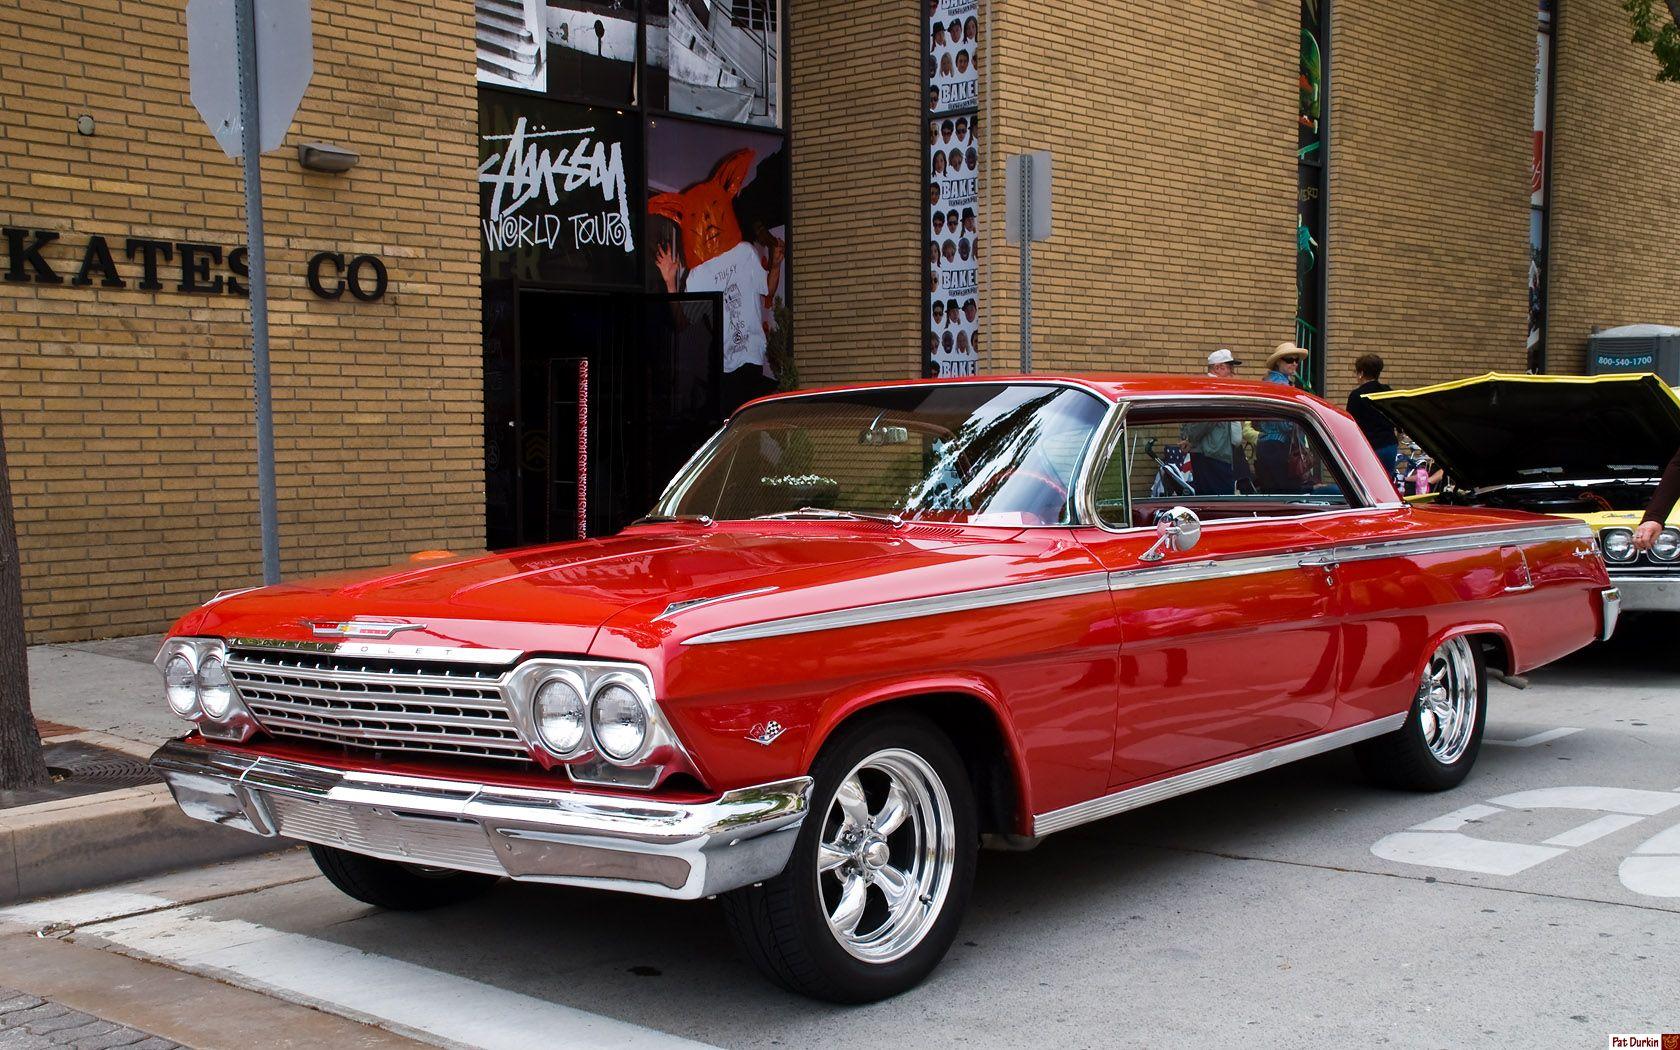 Impala 97 chevy impala : 1962 Impala, red 2-door - I love red - Sweeet Ride! | The Need For ...